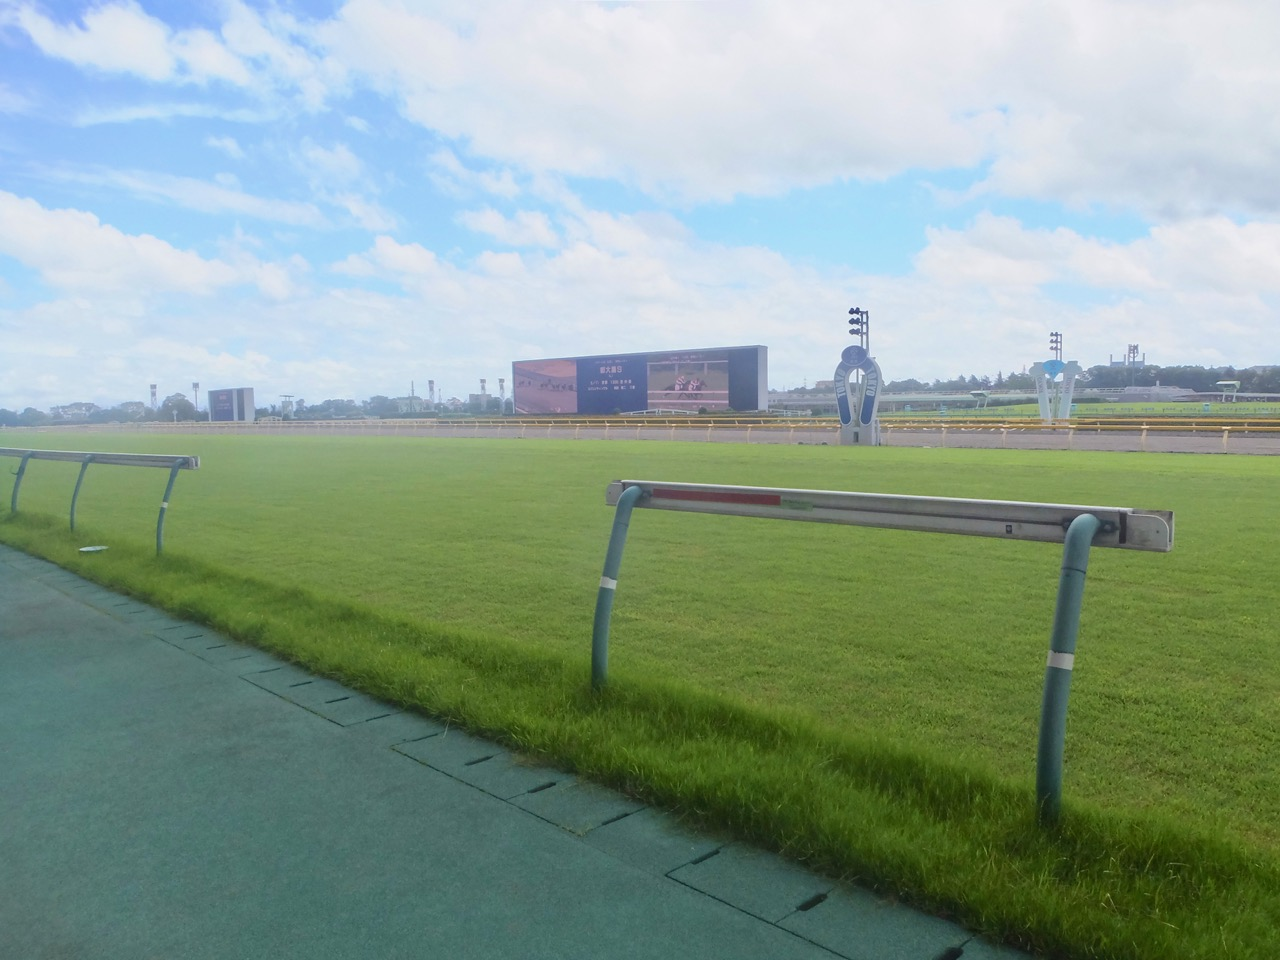 NHKマイルカップ2020競馬予想に。過去の結果から1〜3着馬の前走データをレース映像分析【傾向・追い切り・オッズ】